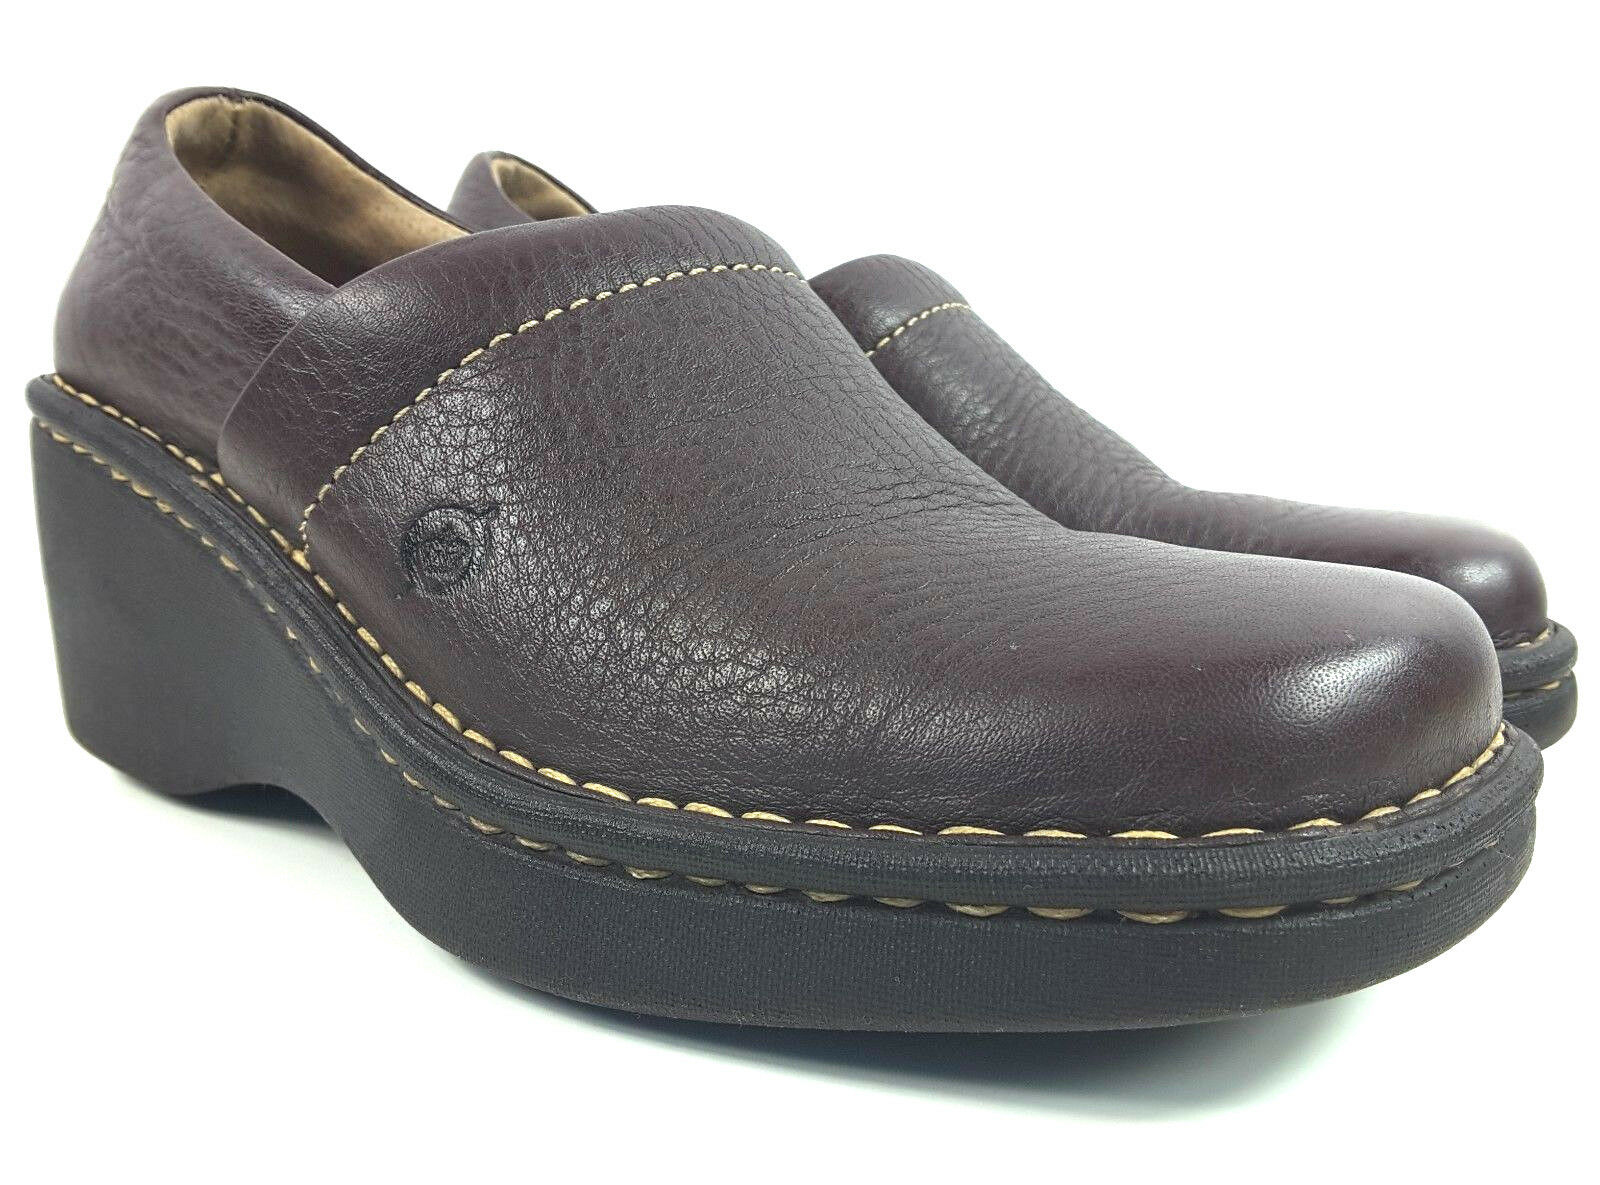 Born Boc Women's Brown Pebbled Leather Clogs Comfort shoes Size 6